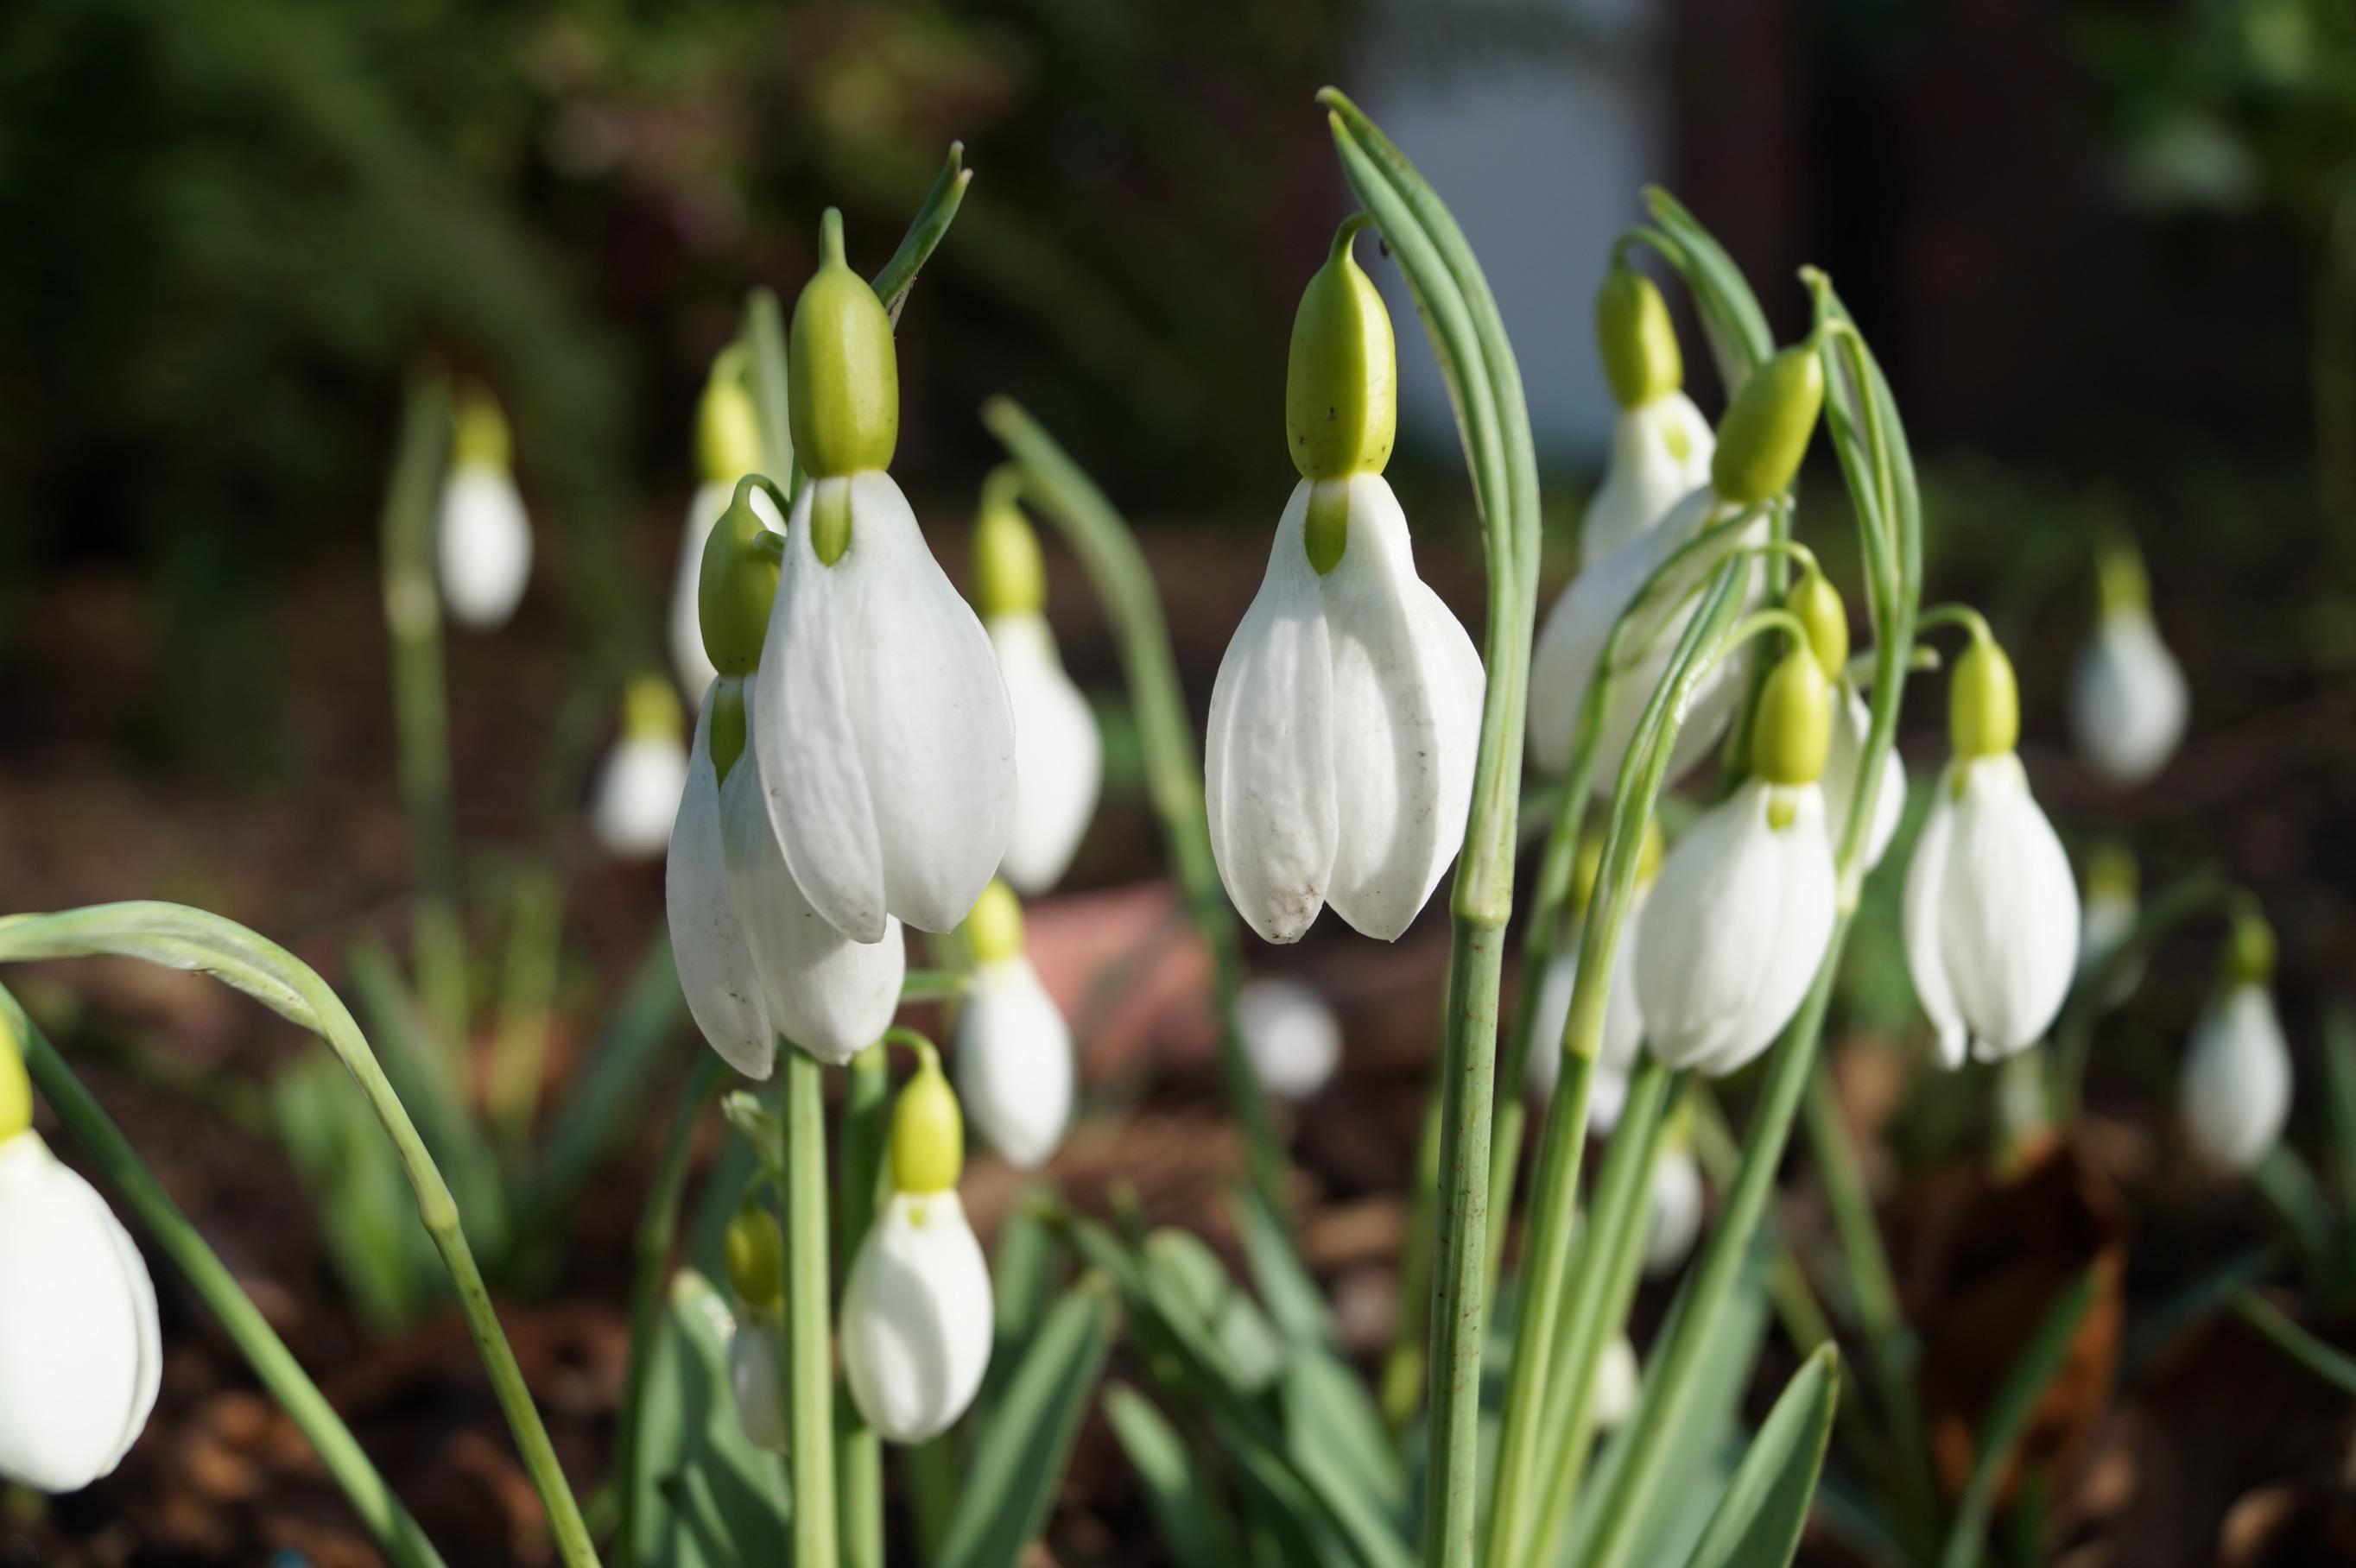 galanthus_bloomer_morlas_plants